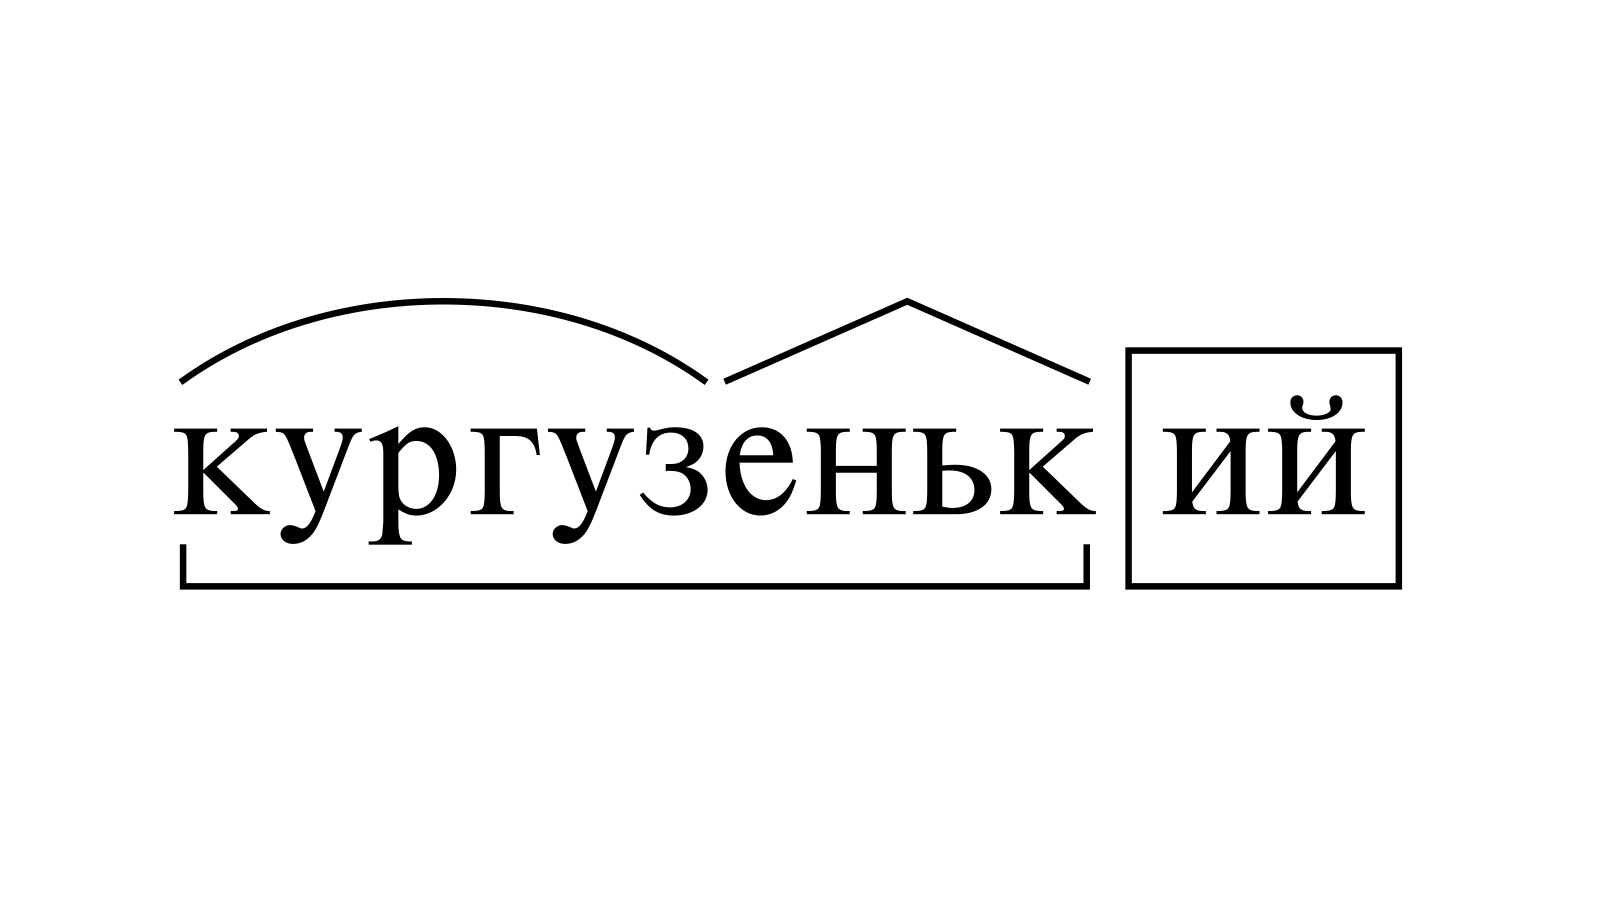 Разбор слова «кургузенький» по составу